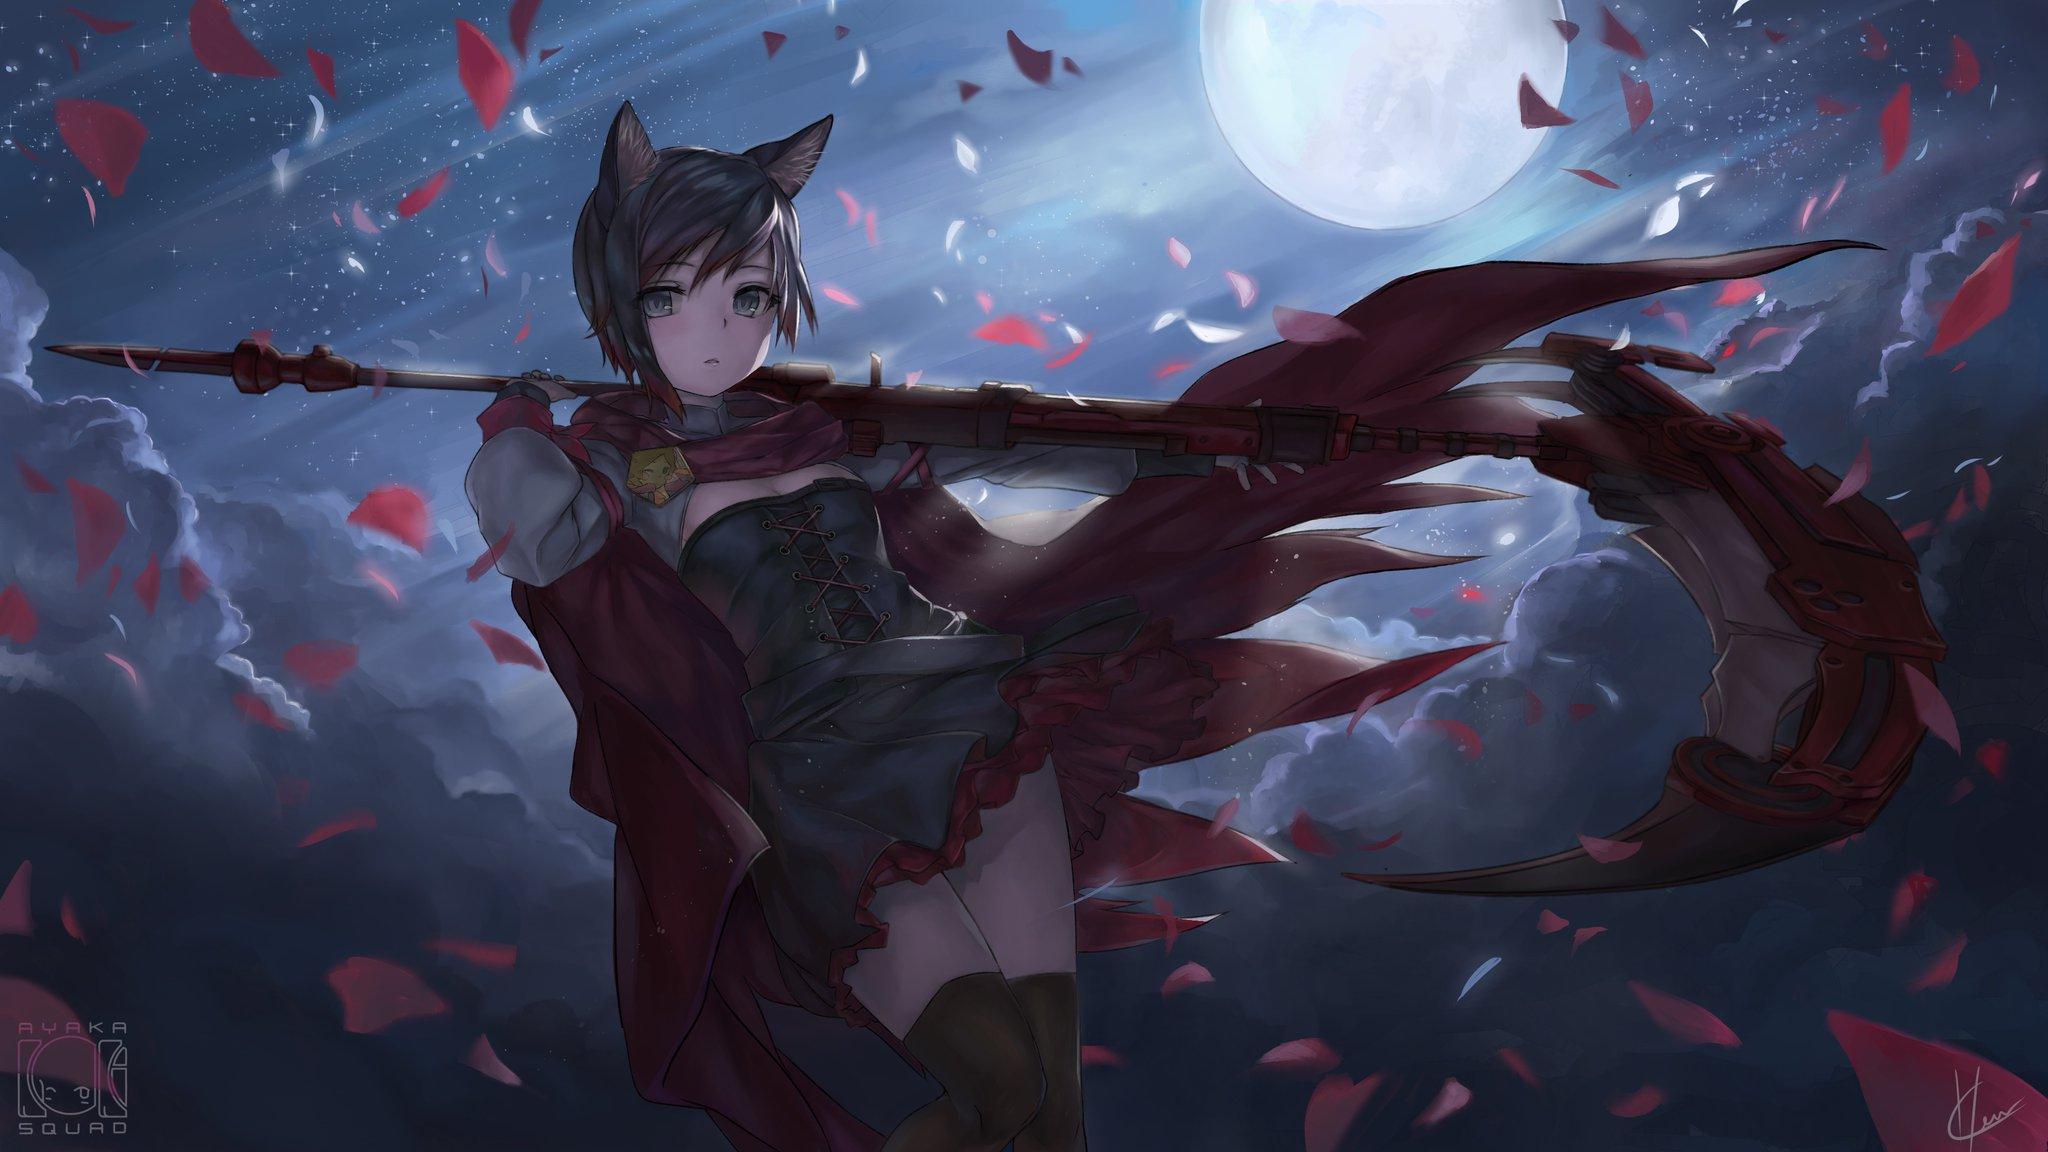 Anime 2048x1152 nekomimi cat girl scythe RWBY